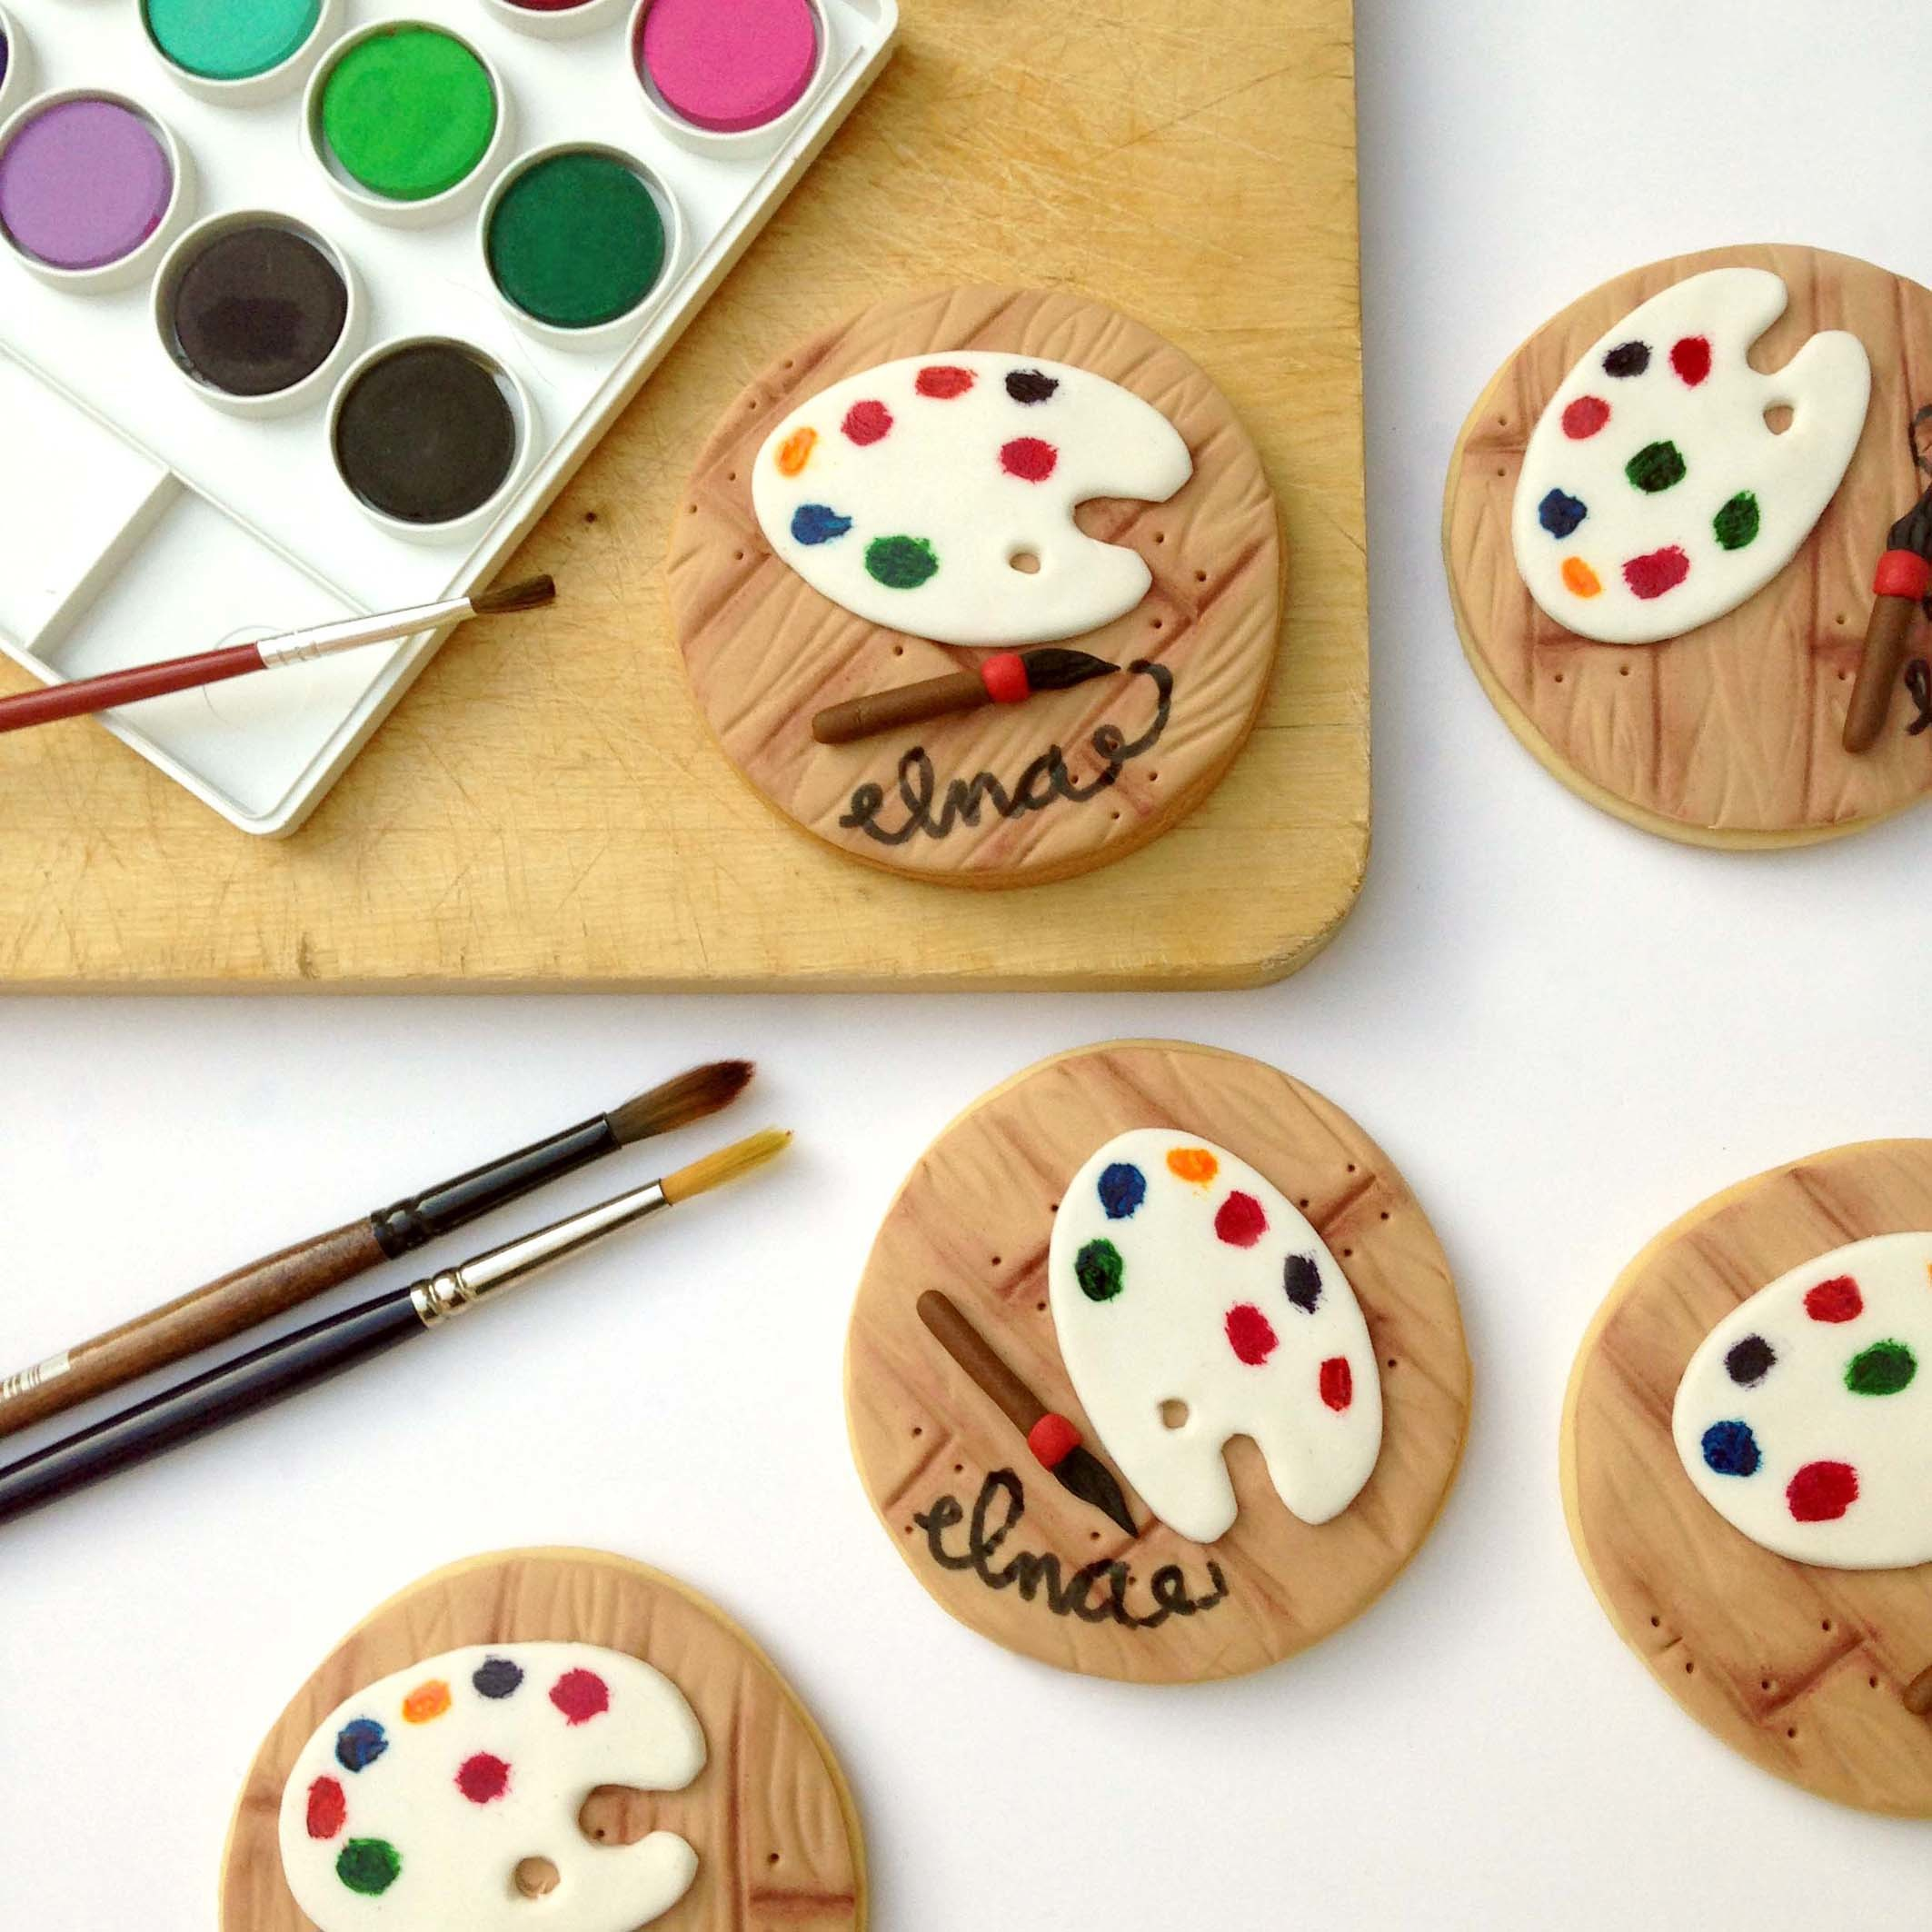 Fondant Artist Palette Cookies